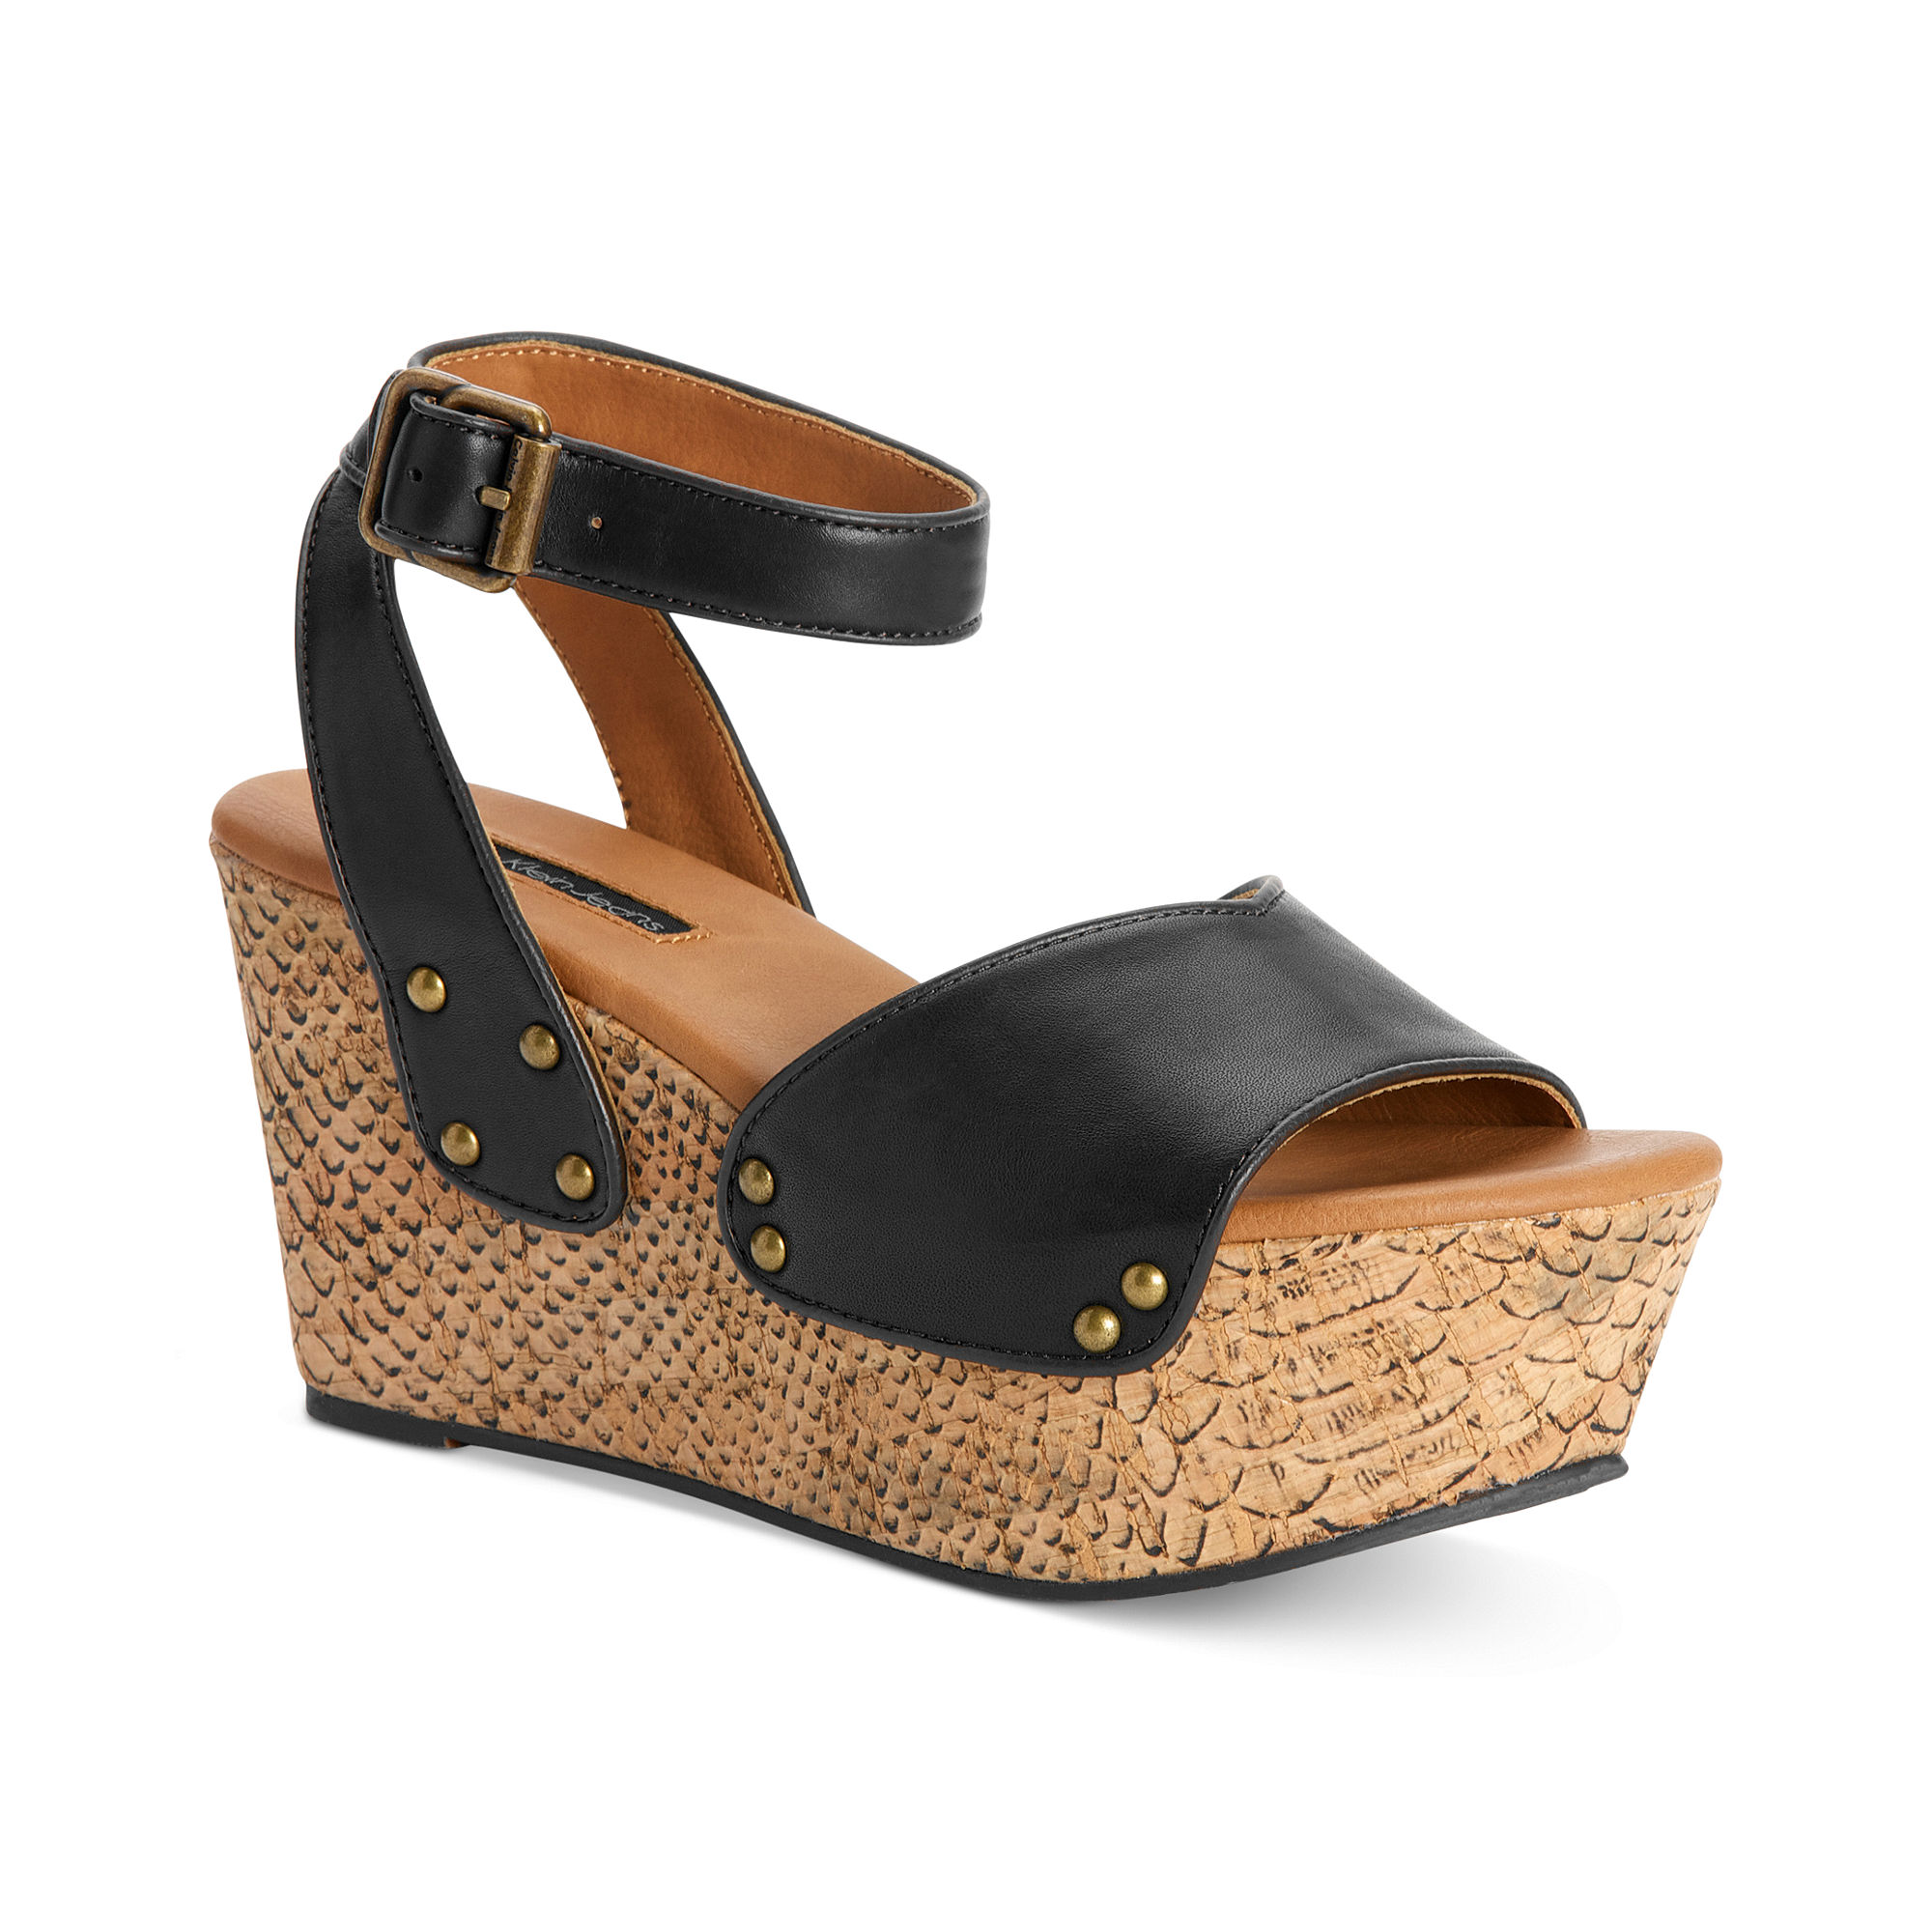 Calvin klein Ck Jeans Womens Shoes Calla Platform Wedge ...